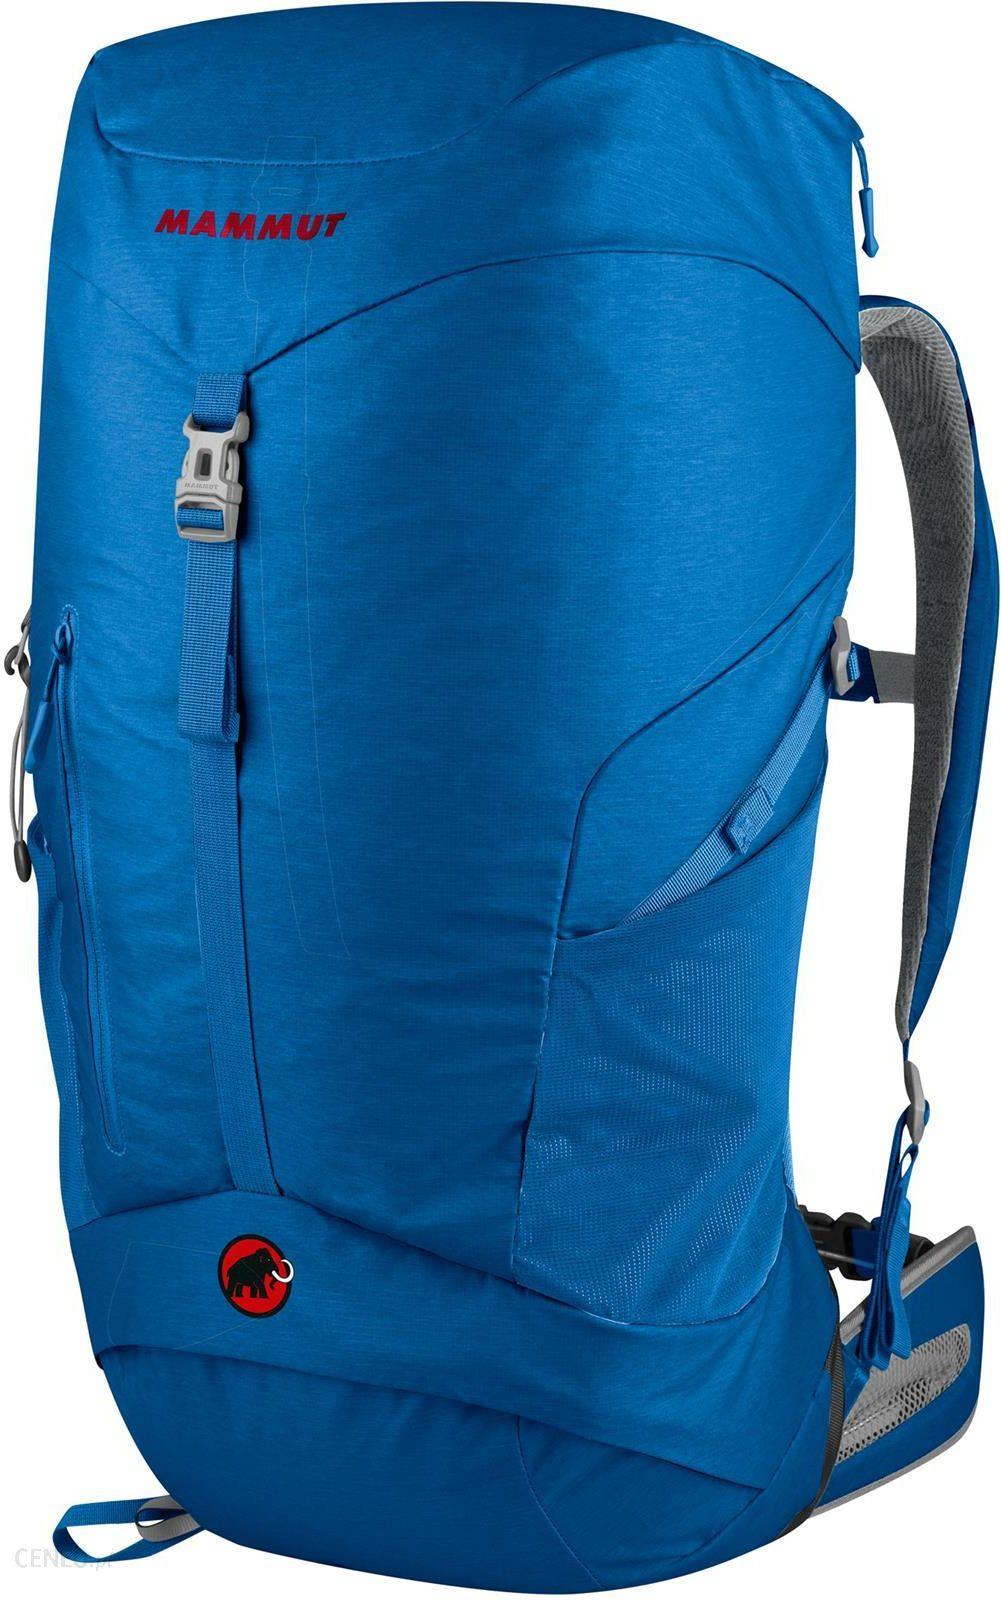 2745f48b5c2a0 Plecak Mammut Creon Guide 35 - Ceny i opinie - Ceneo.pl